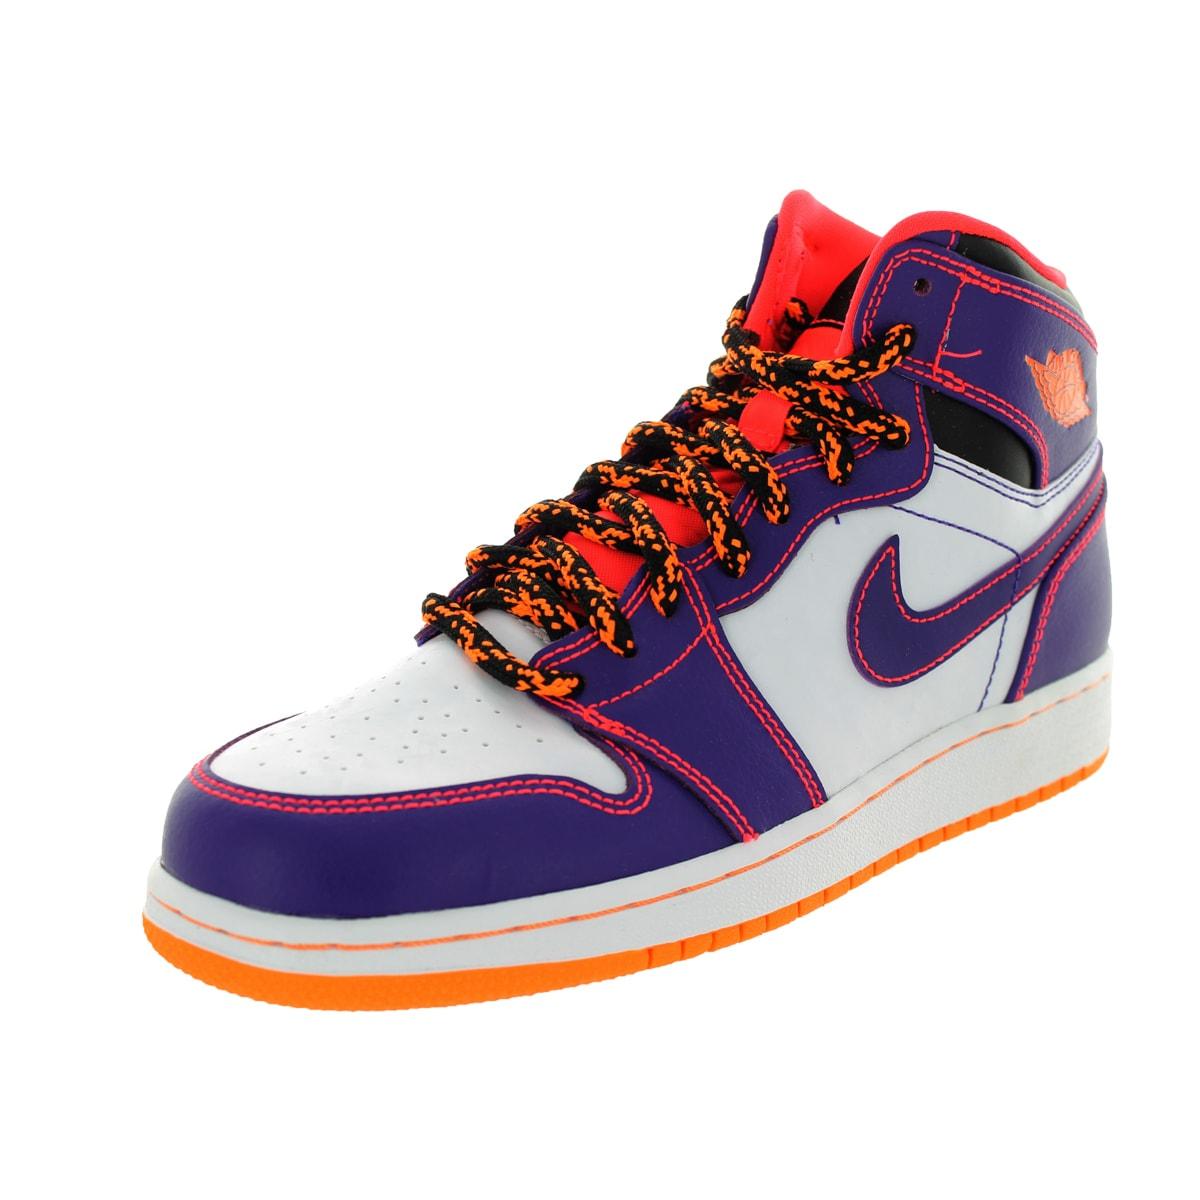 Nike Jordan Kid's Air Jordan 1 Retro High Bg Purple/Brgh/...